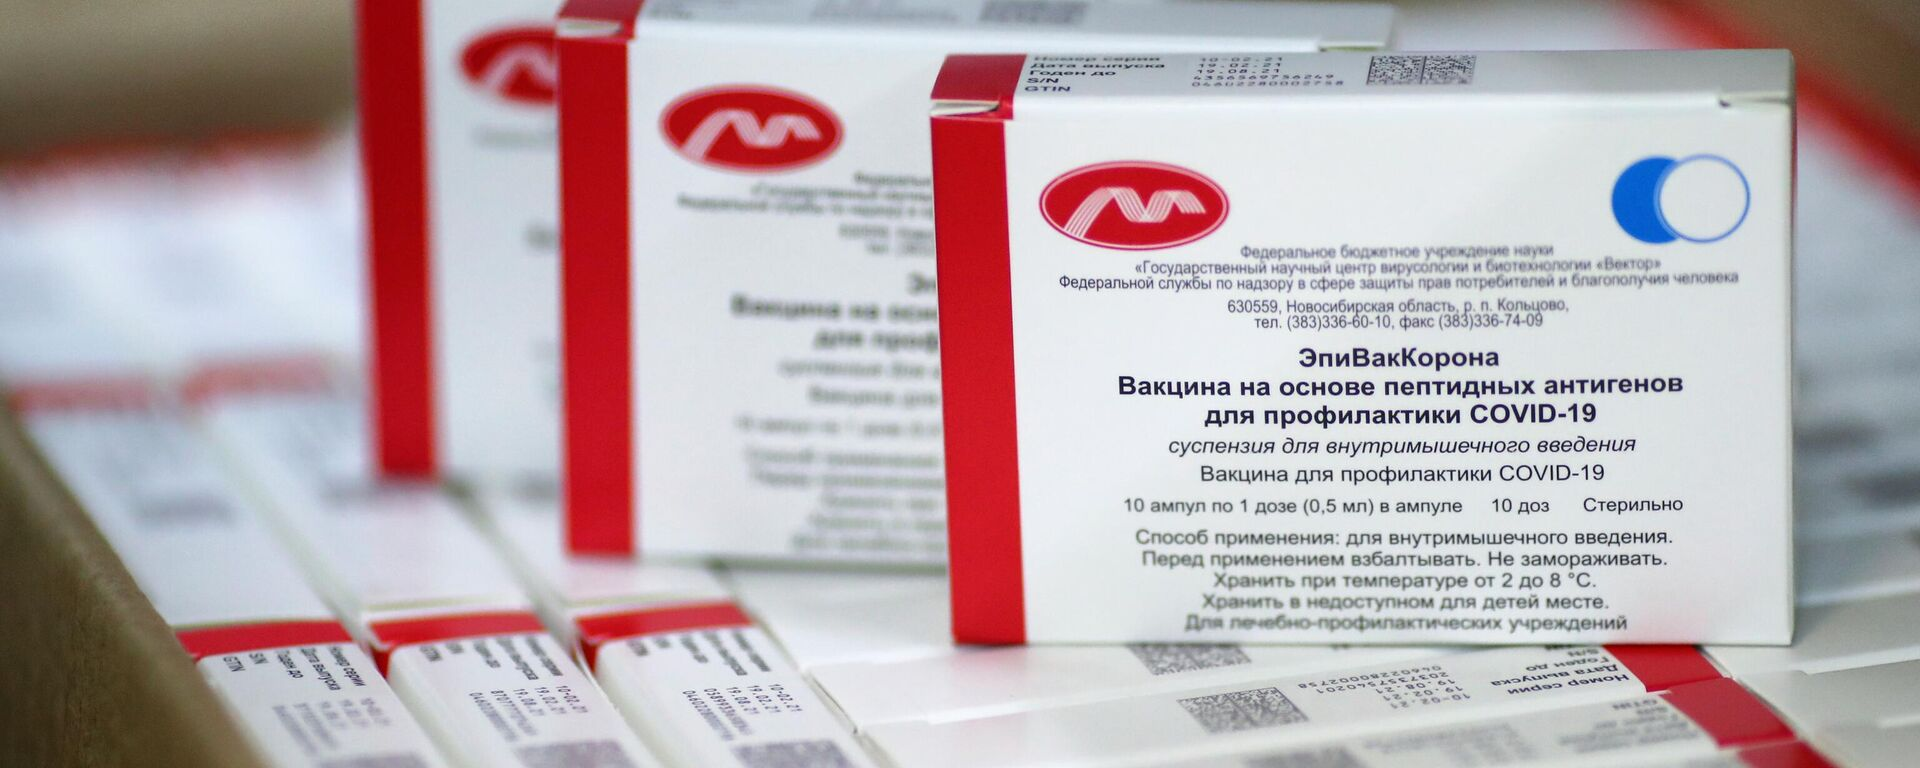 Vacuna anti-COVID rusa EpiVacCorona - Sputnik Mundo, 1920, 30.07.2021